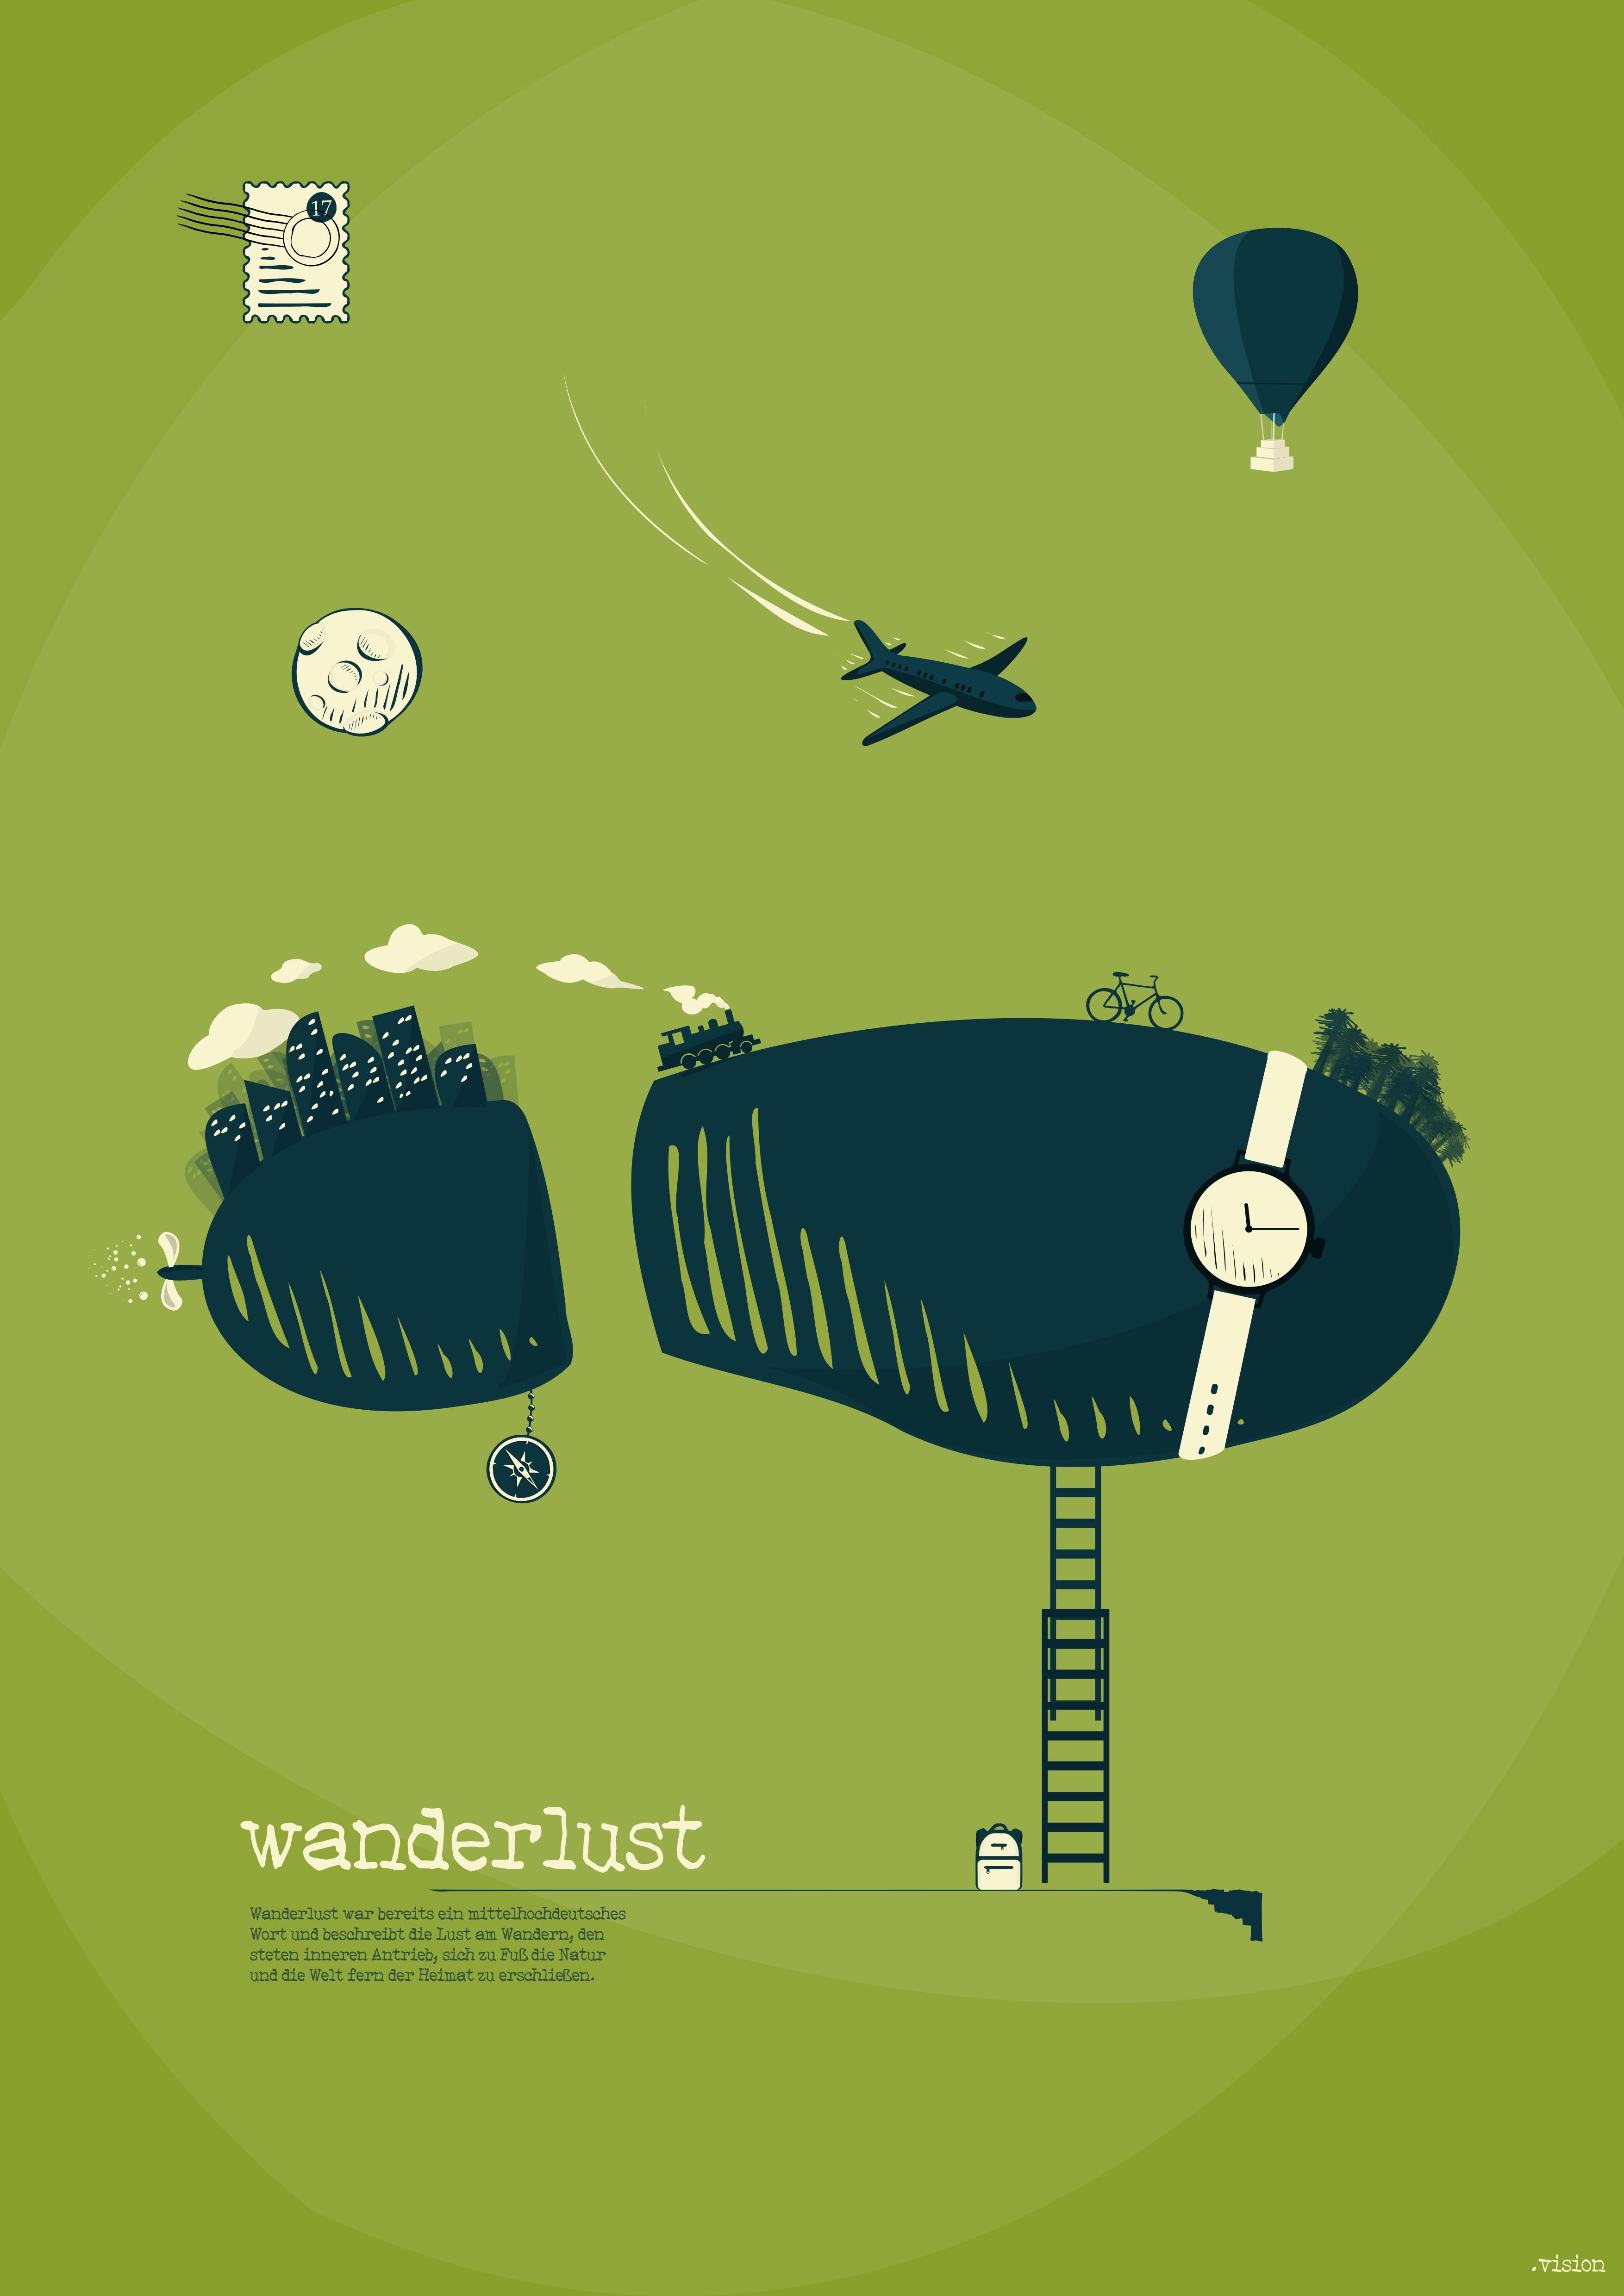 public/img/senzaparole/wanderlust.png